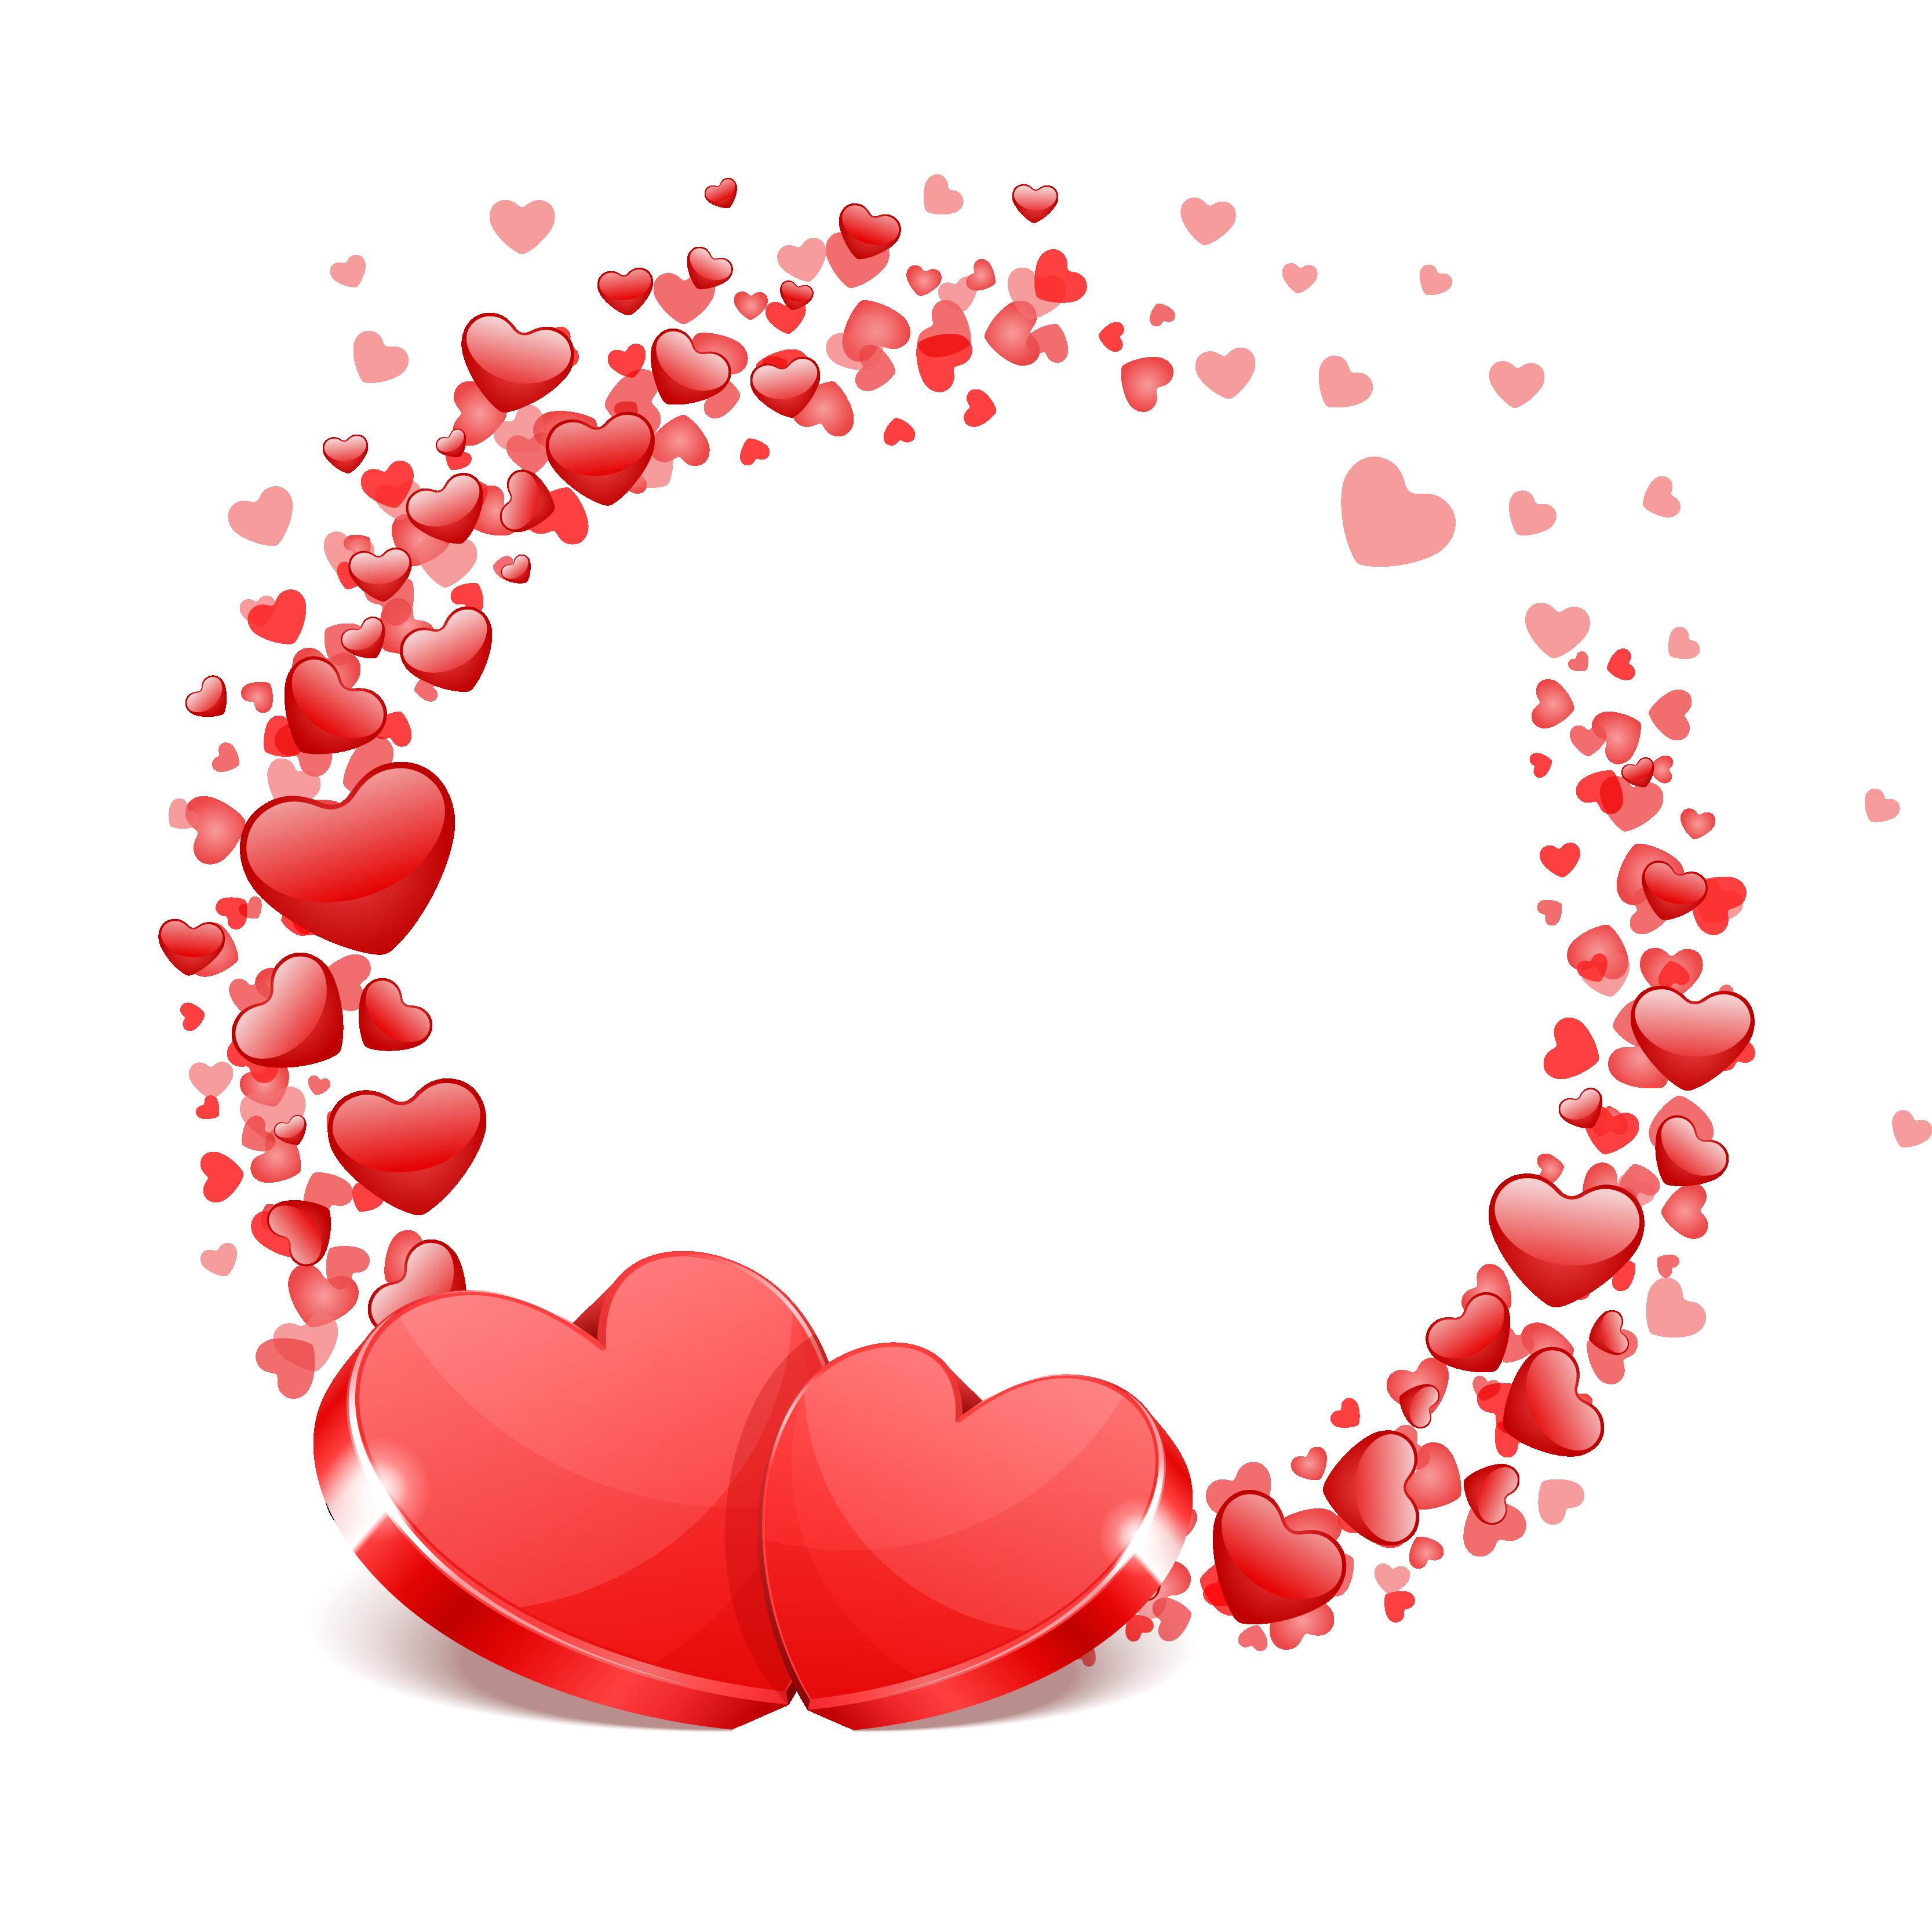 Wedding Festive Love Heart Wedding Vector Love Vector Wedding Clipart Love Clipart Love Png Love Heart Images Heart Pattern Background